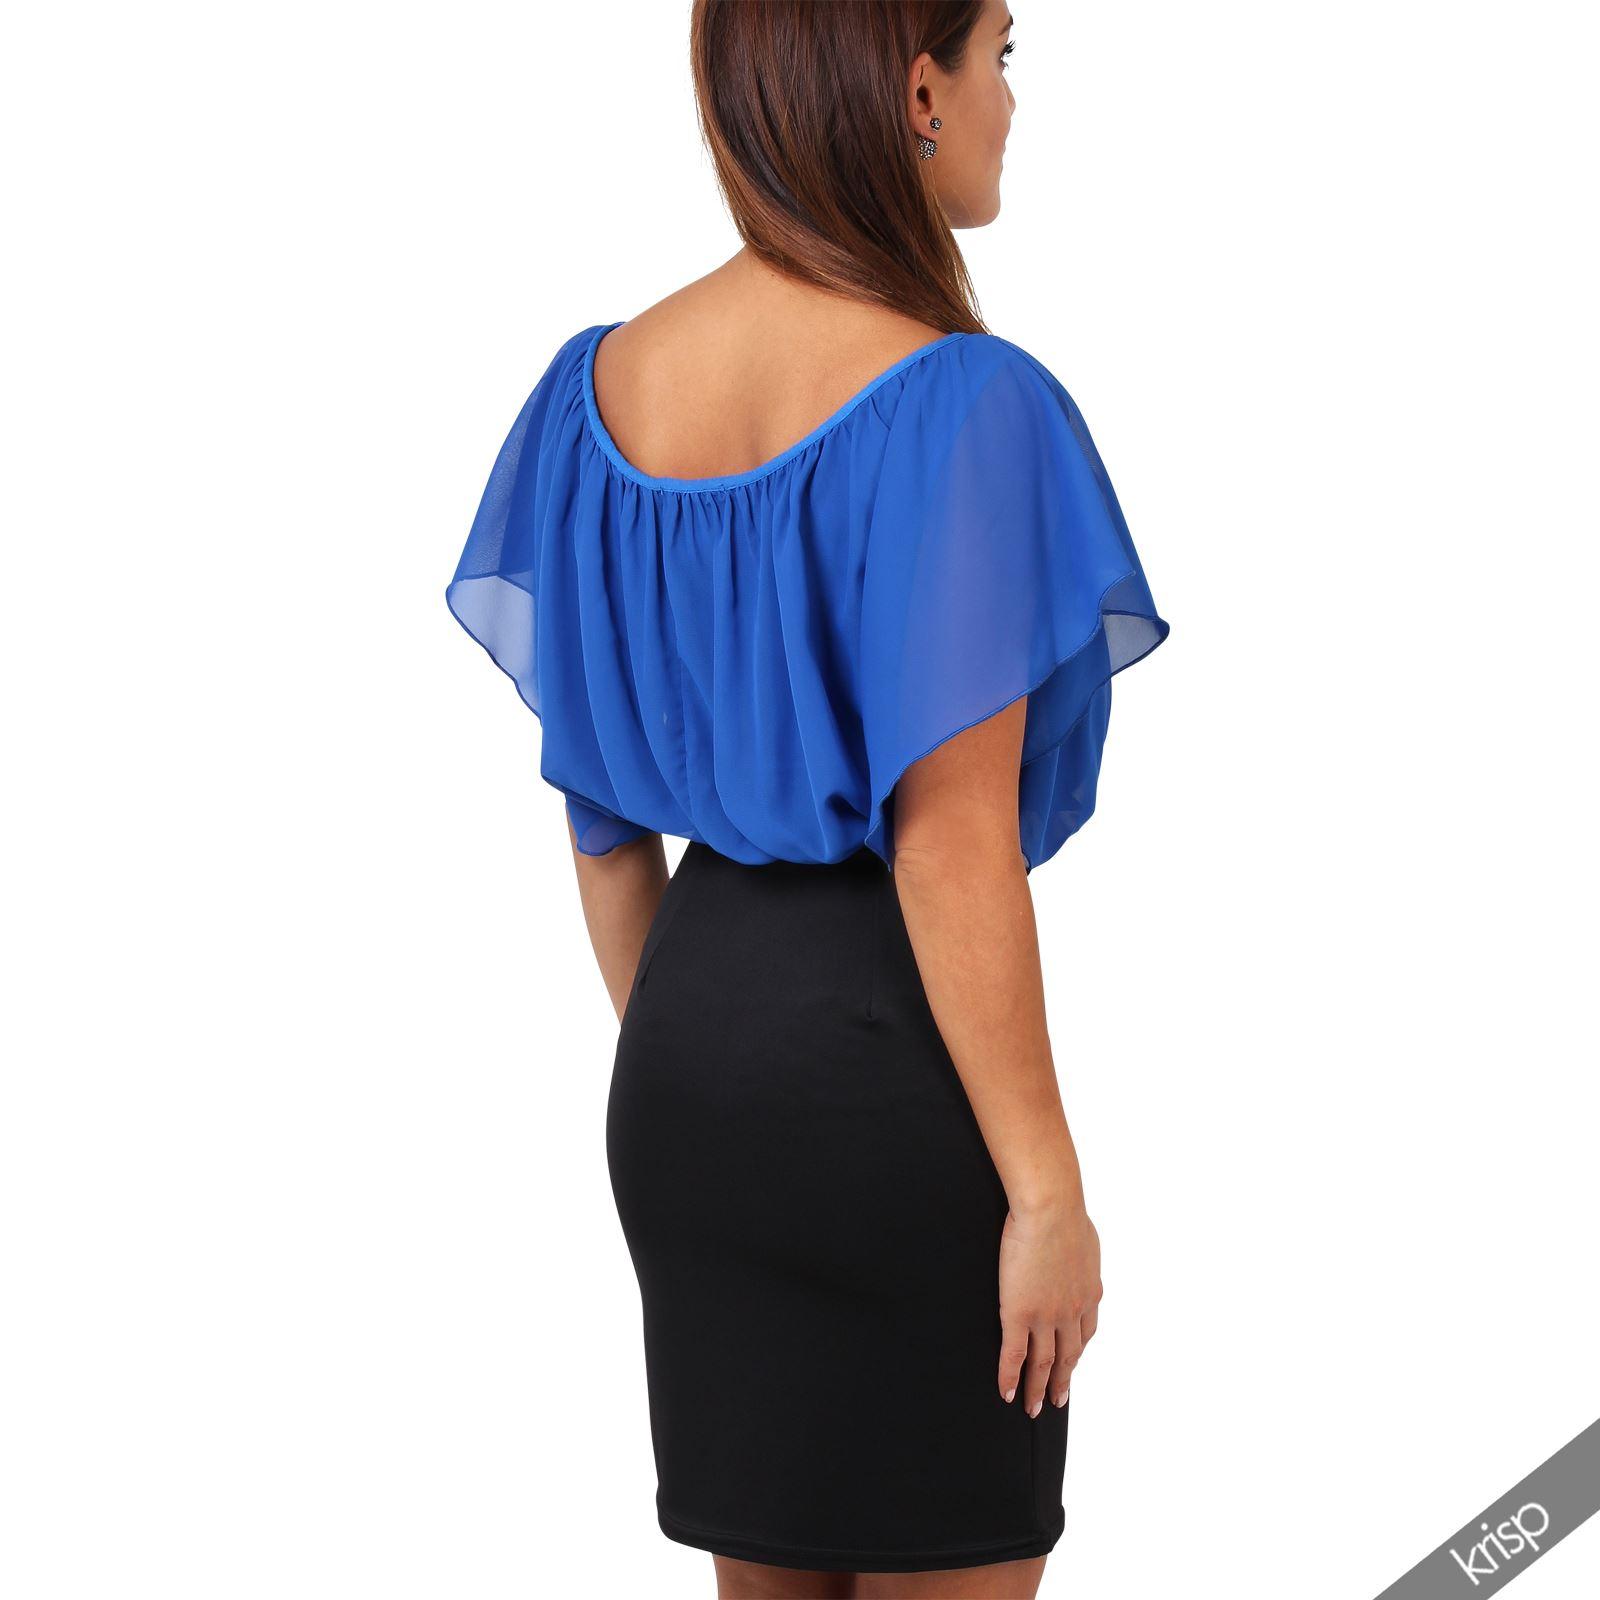 Womens-Pleated-Chiffon-Batwing-Top-High-Waist-Pencil-Bodycon-Skirt-Mini-Dress thumbnail 28